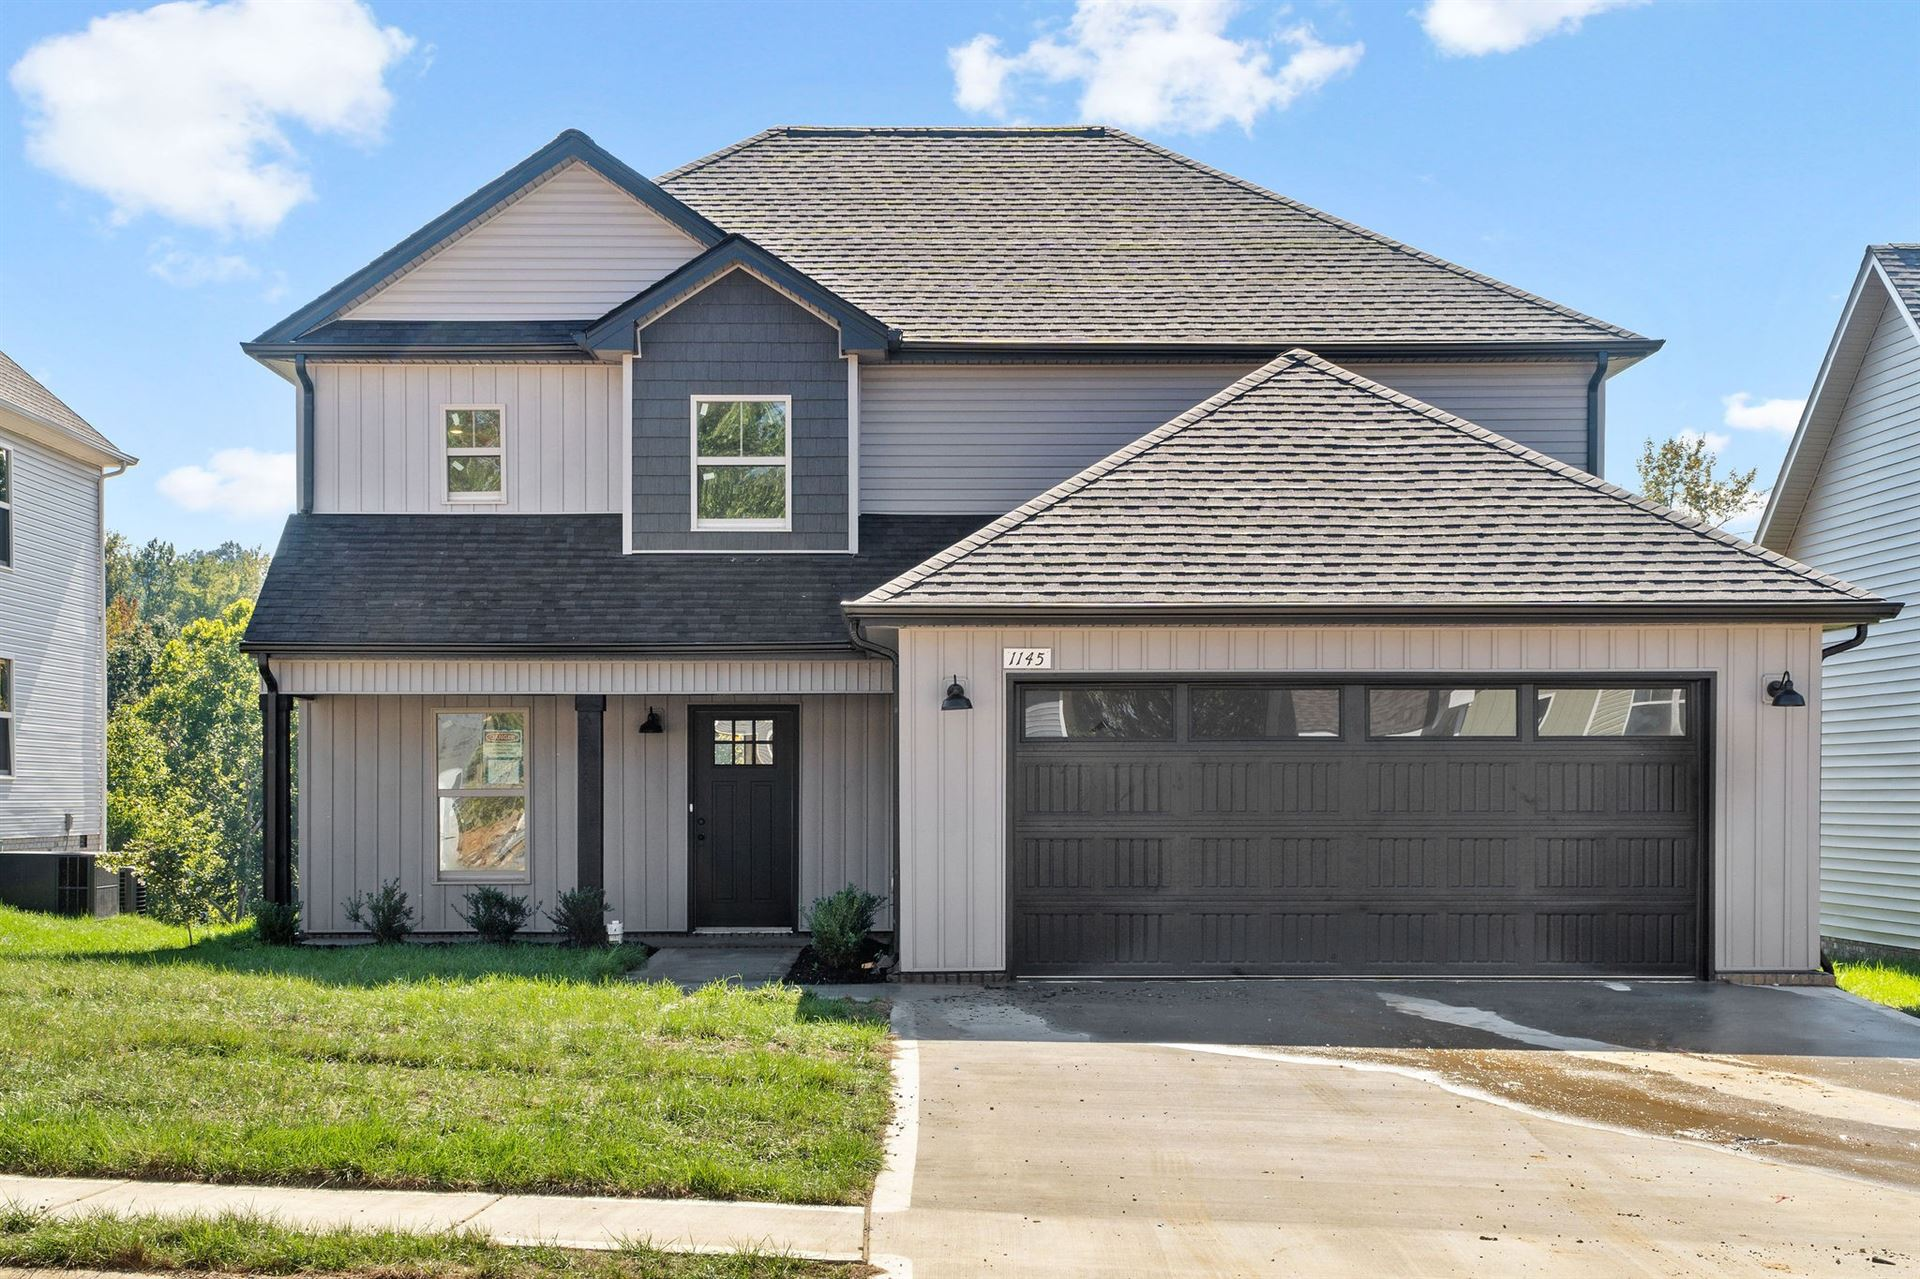 1145 Old Charlotte Trce, Clarksville, TN 37040 - MLS#: 2296791